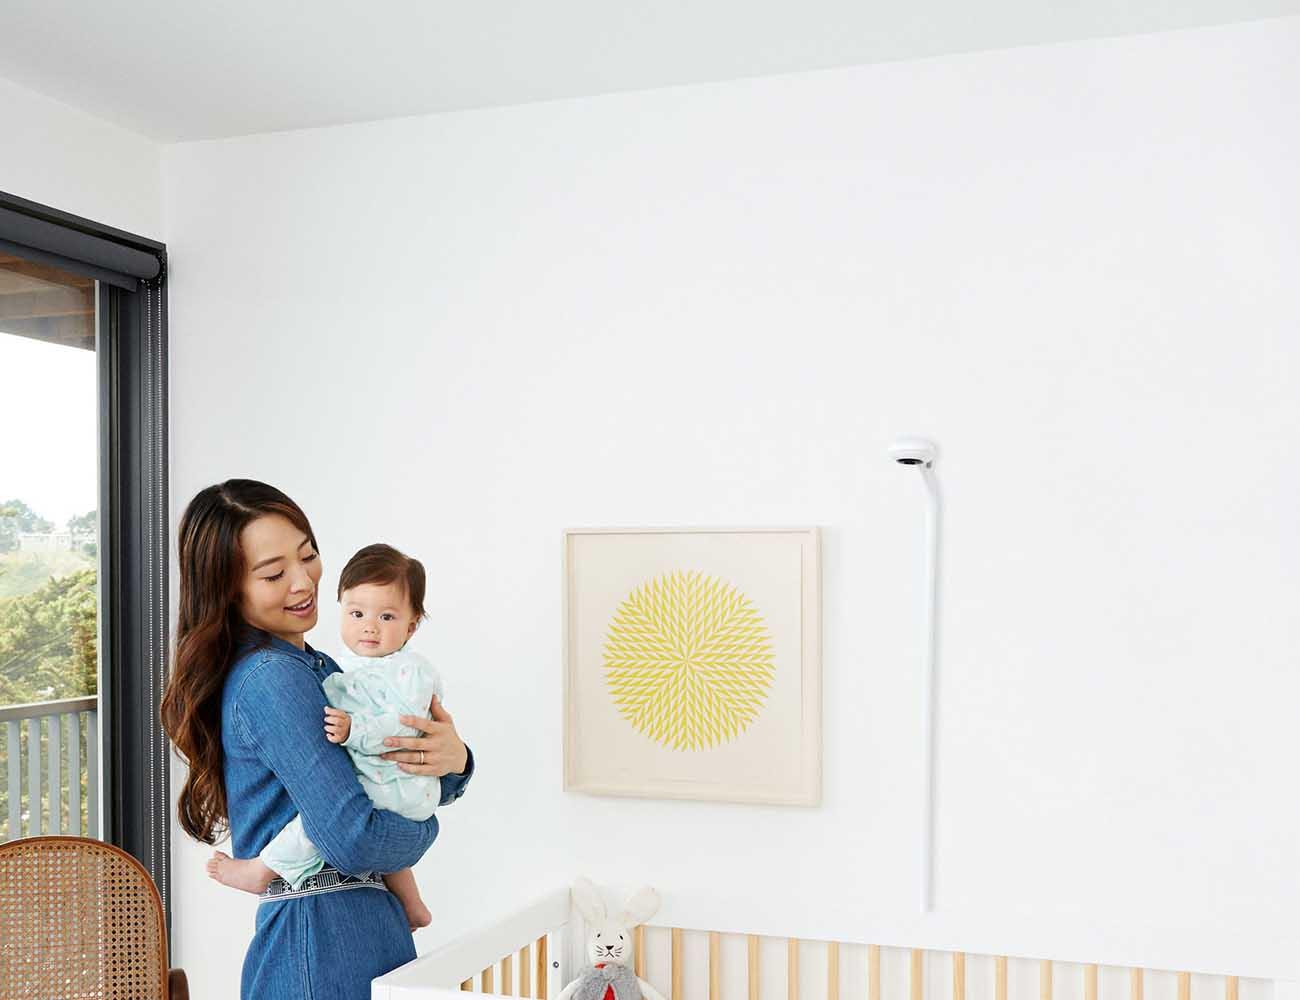 Nanit Baby Monitor and Sleep Tracker